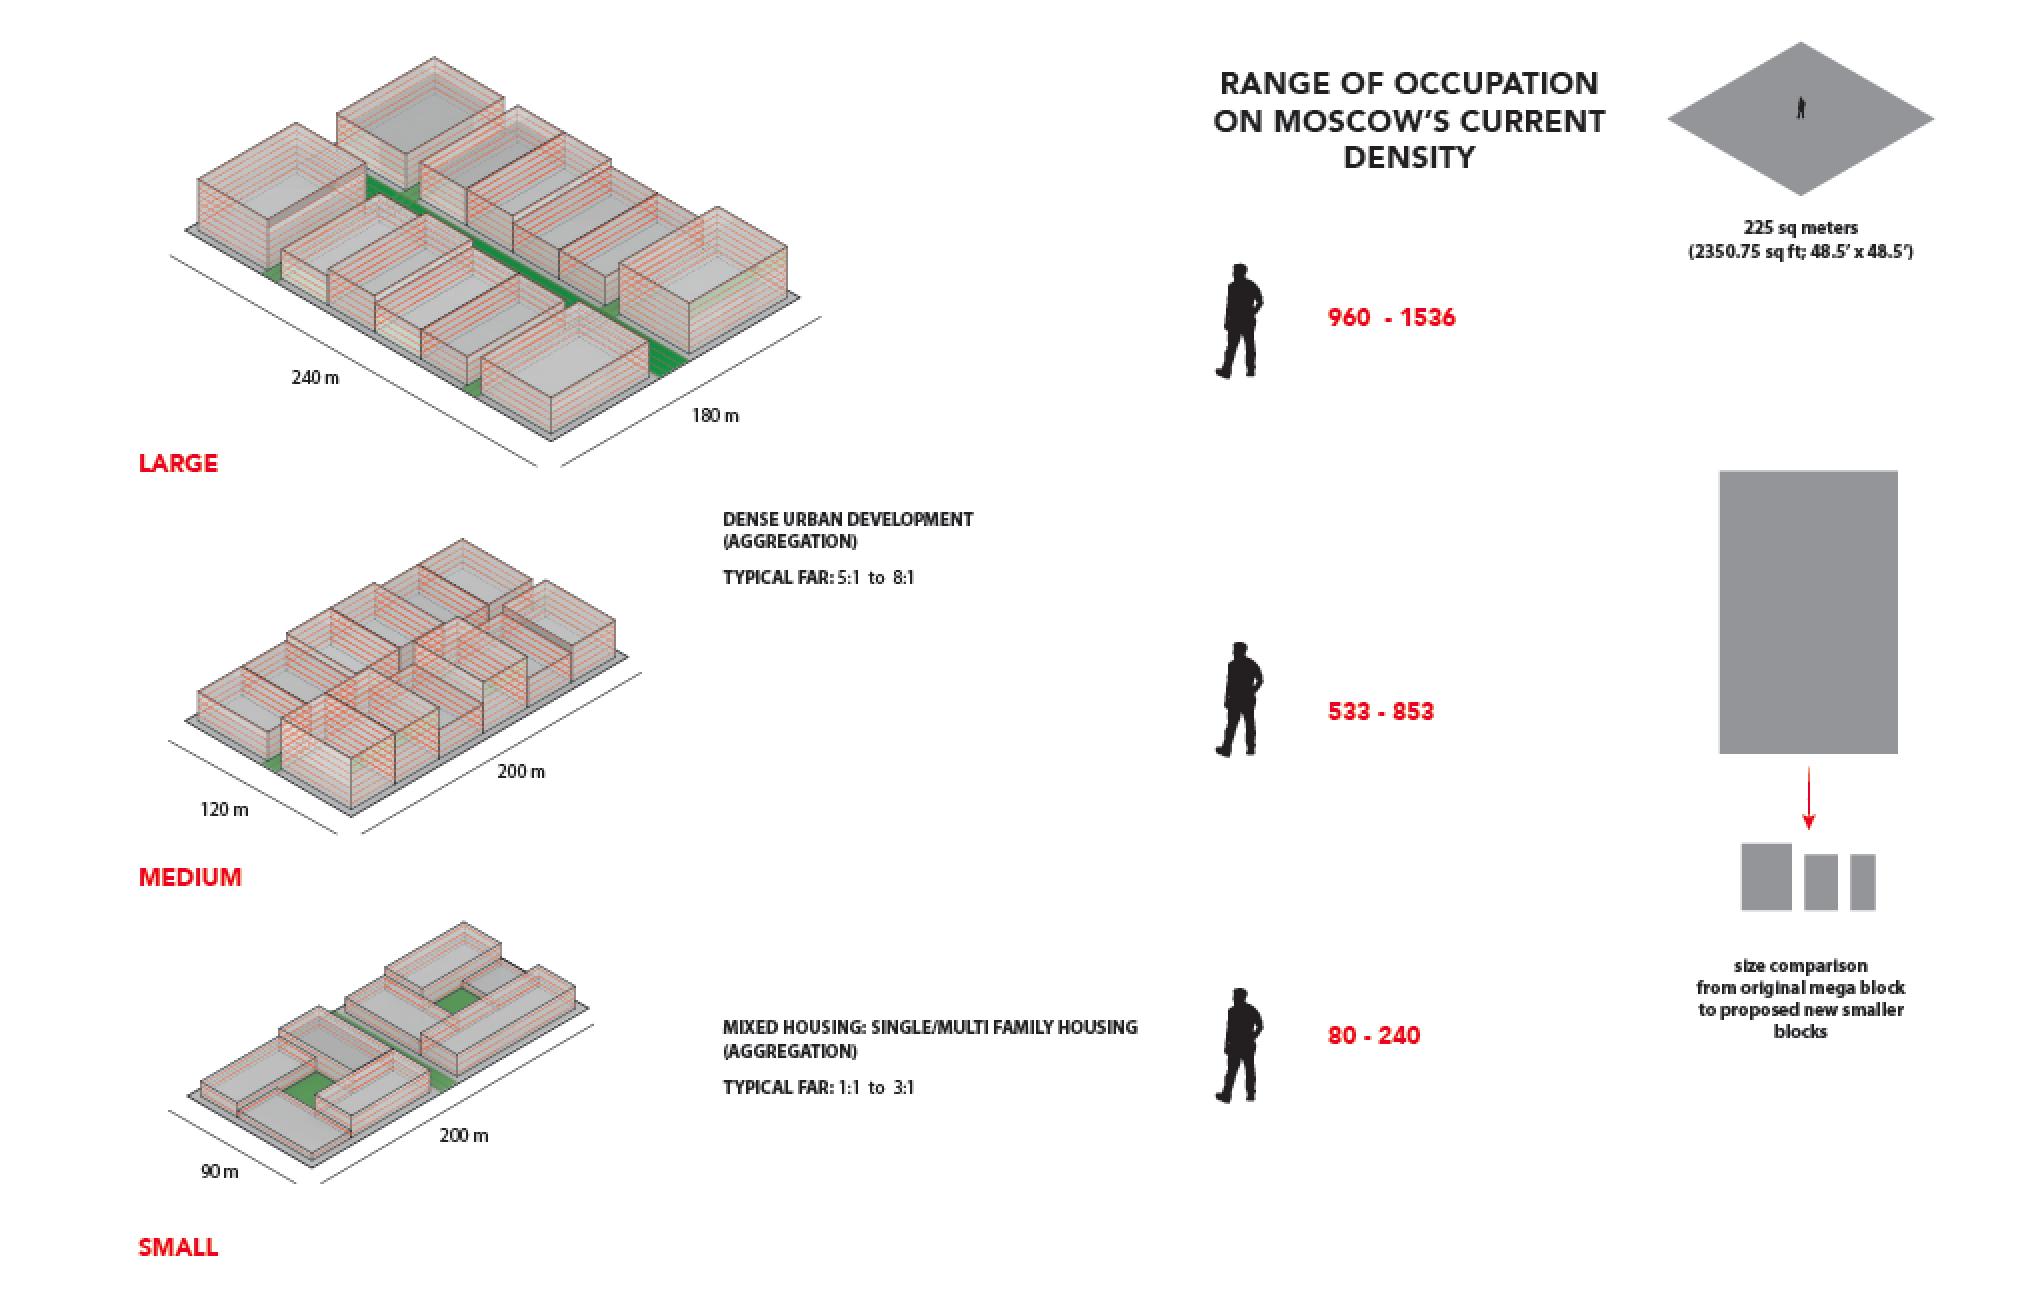 Moscow Density Analyses (FAR)